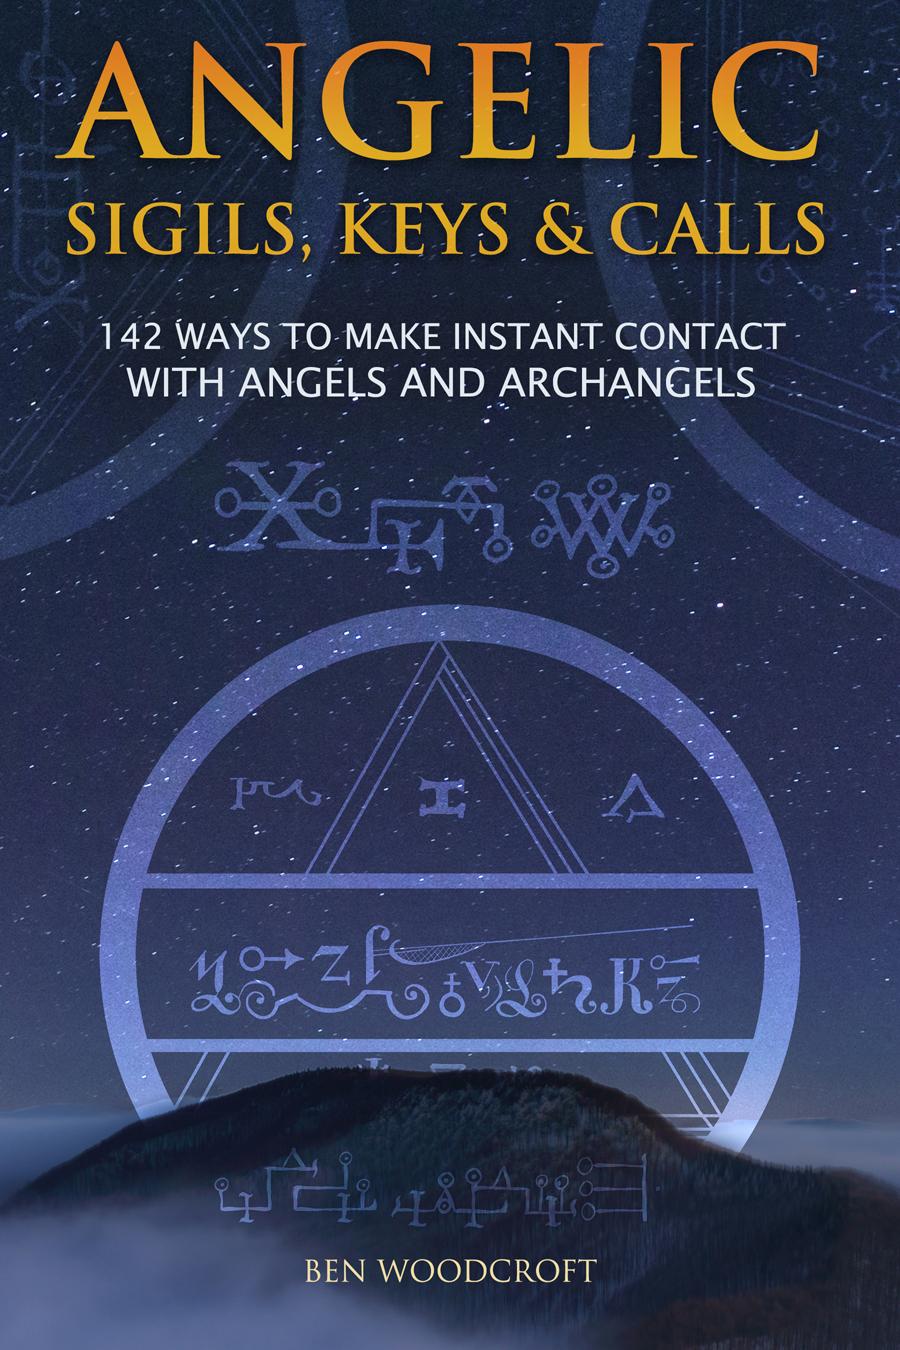 Angelic Sigils, Keys and Calls by Ben Woodcroft